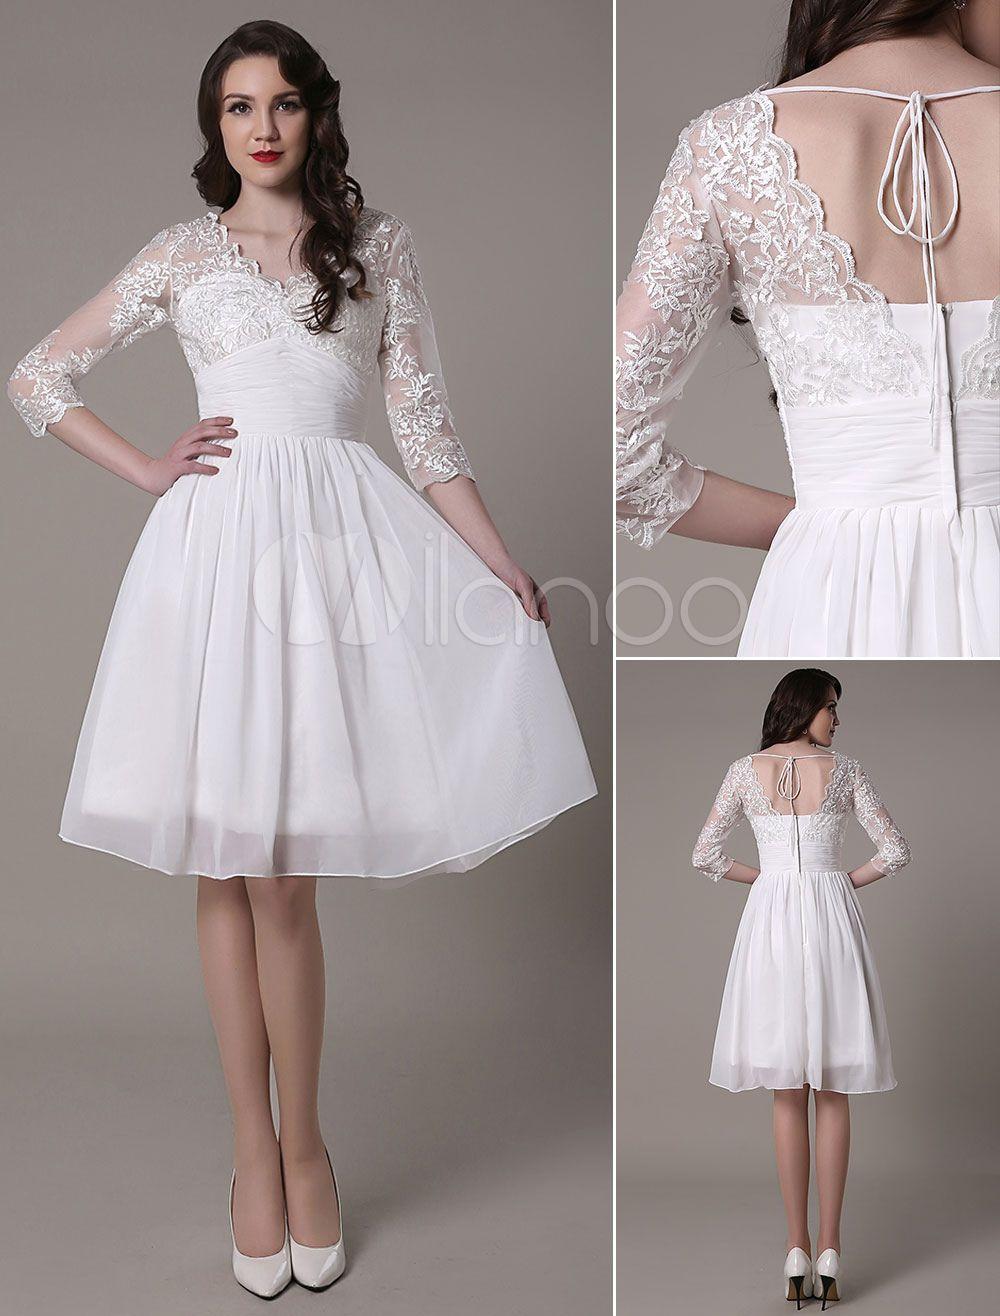 Knee-Length Wedding Dress V-Neck Lace A-Line Chiffon Pleated Bridal Dress